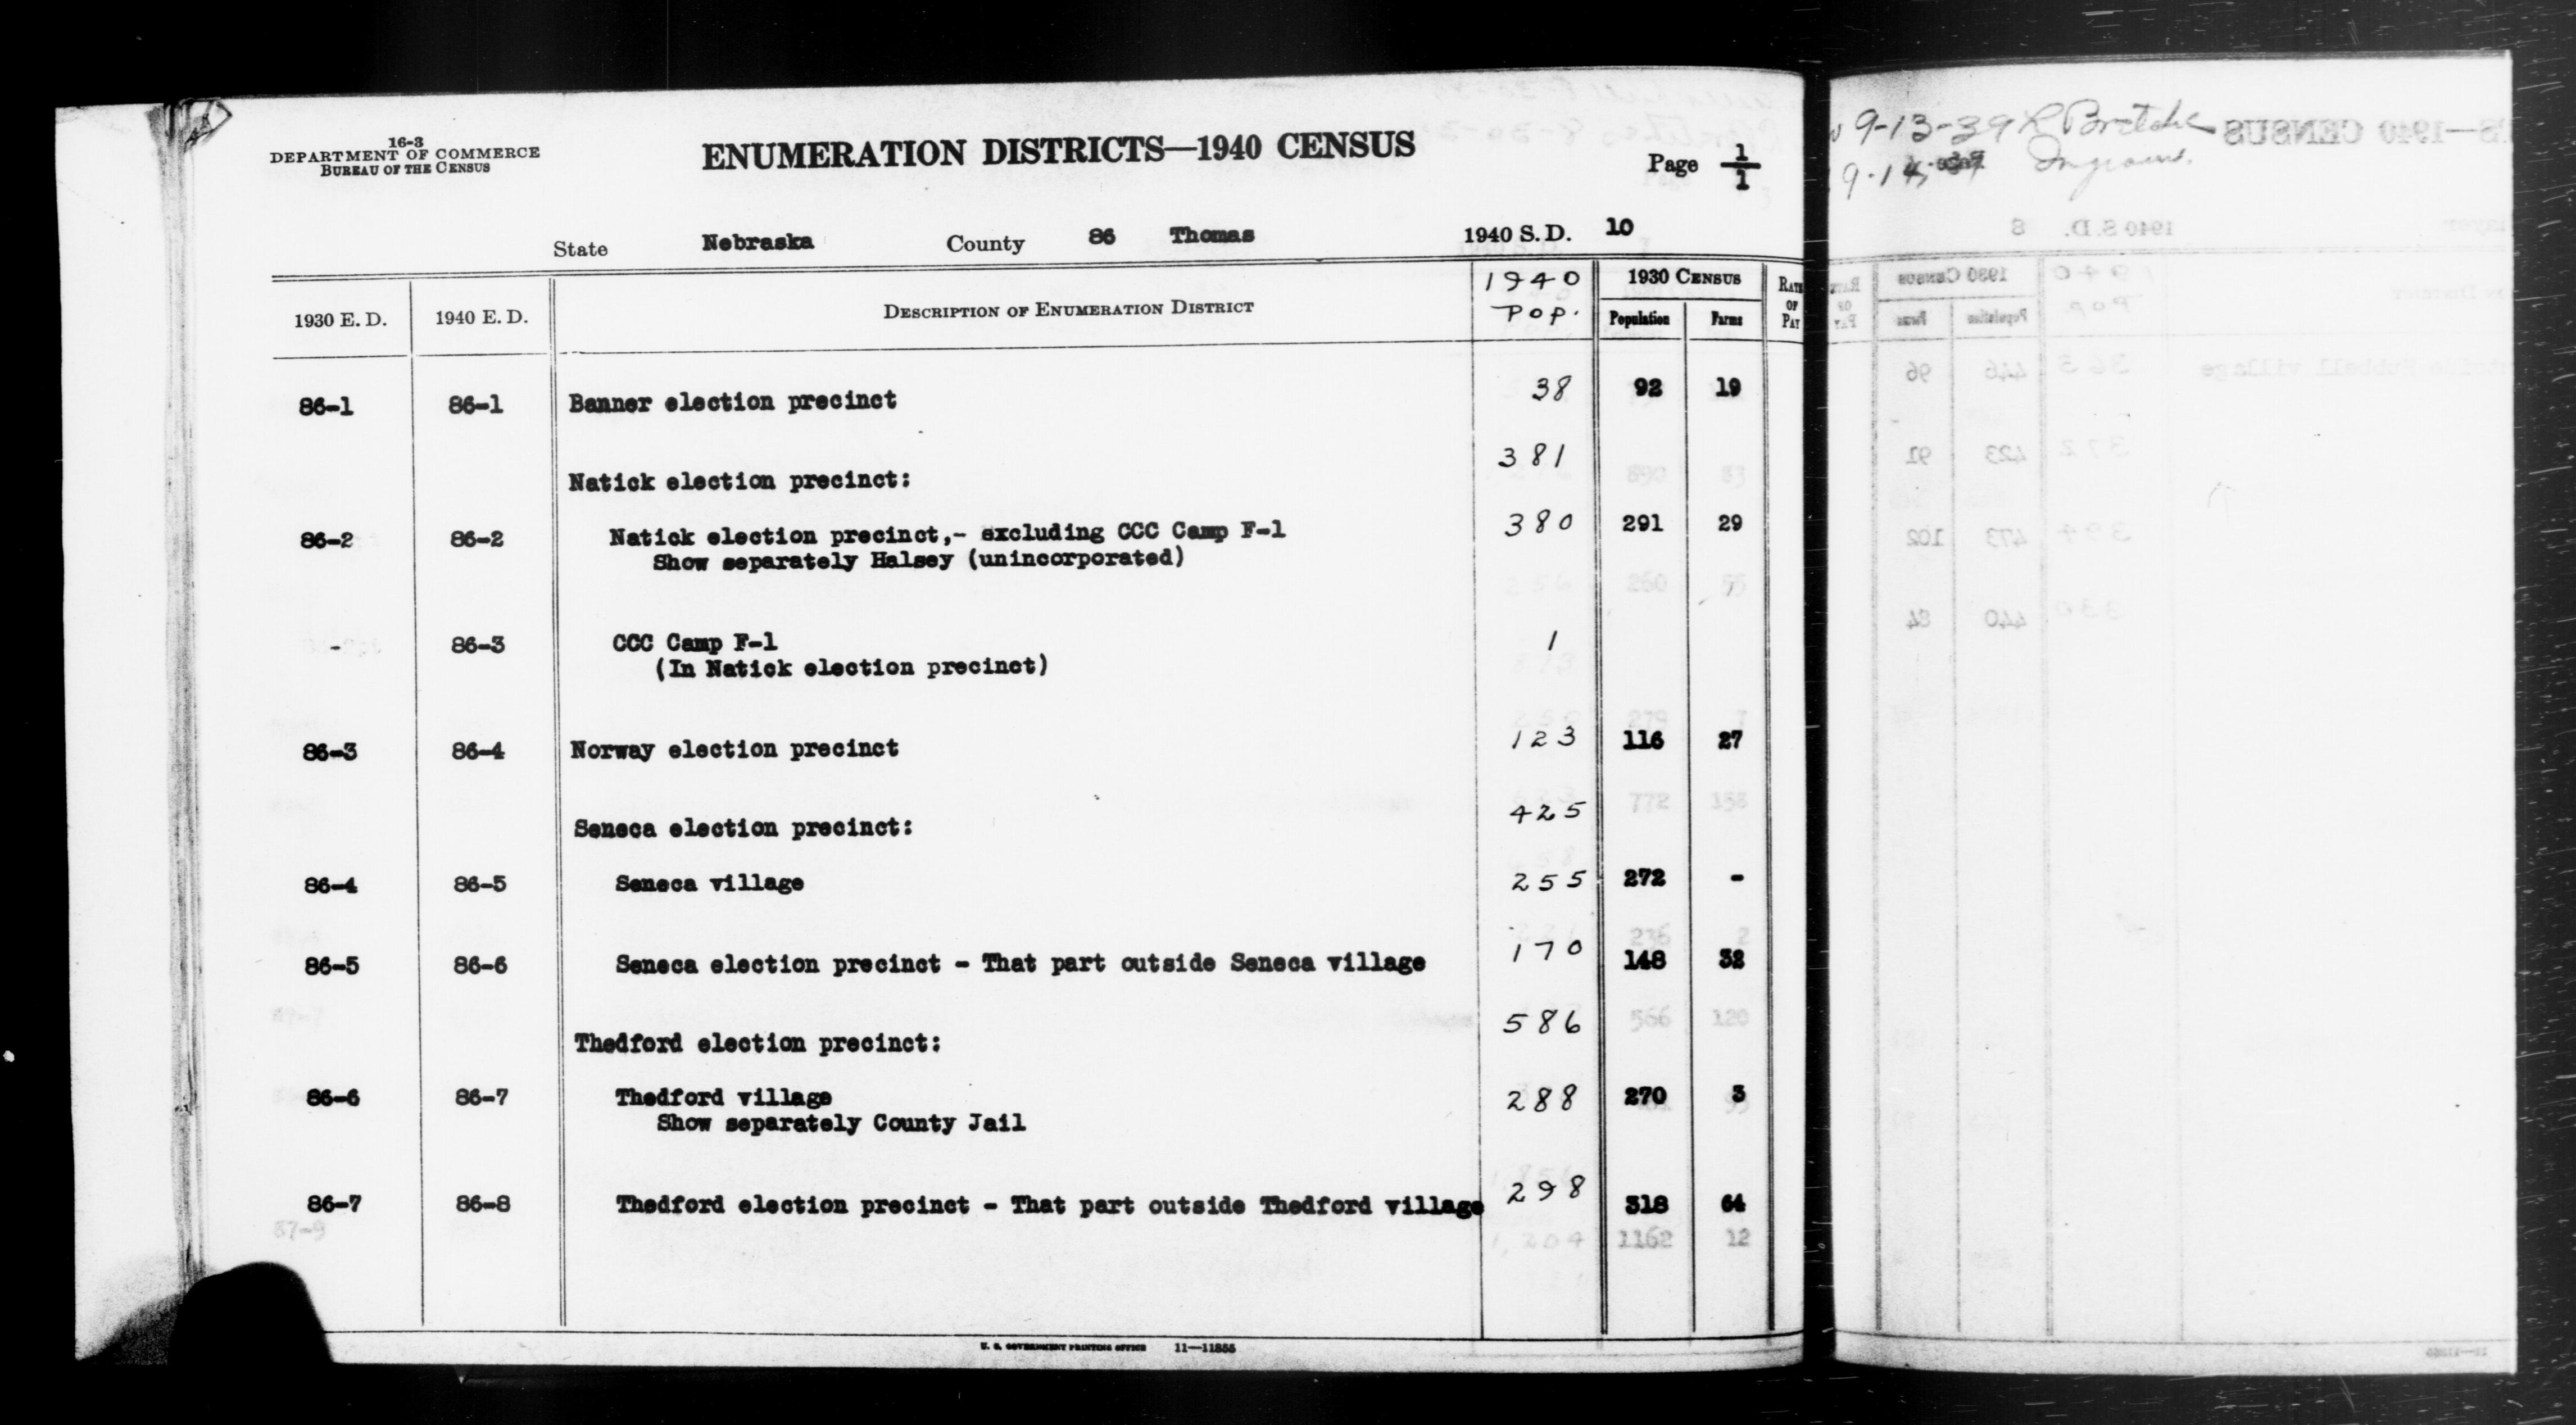 1940 Census Enumeration District Descriptions - Nebraska - Thomas County - ED 86-1, ED 86-2, ED 86-3, ED 86-4, ED 86-5, ED 86-6, ED 86-7, ED 86-8